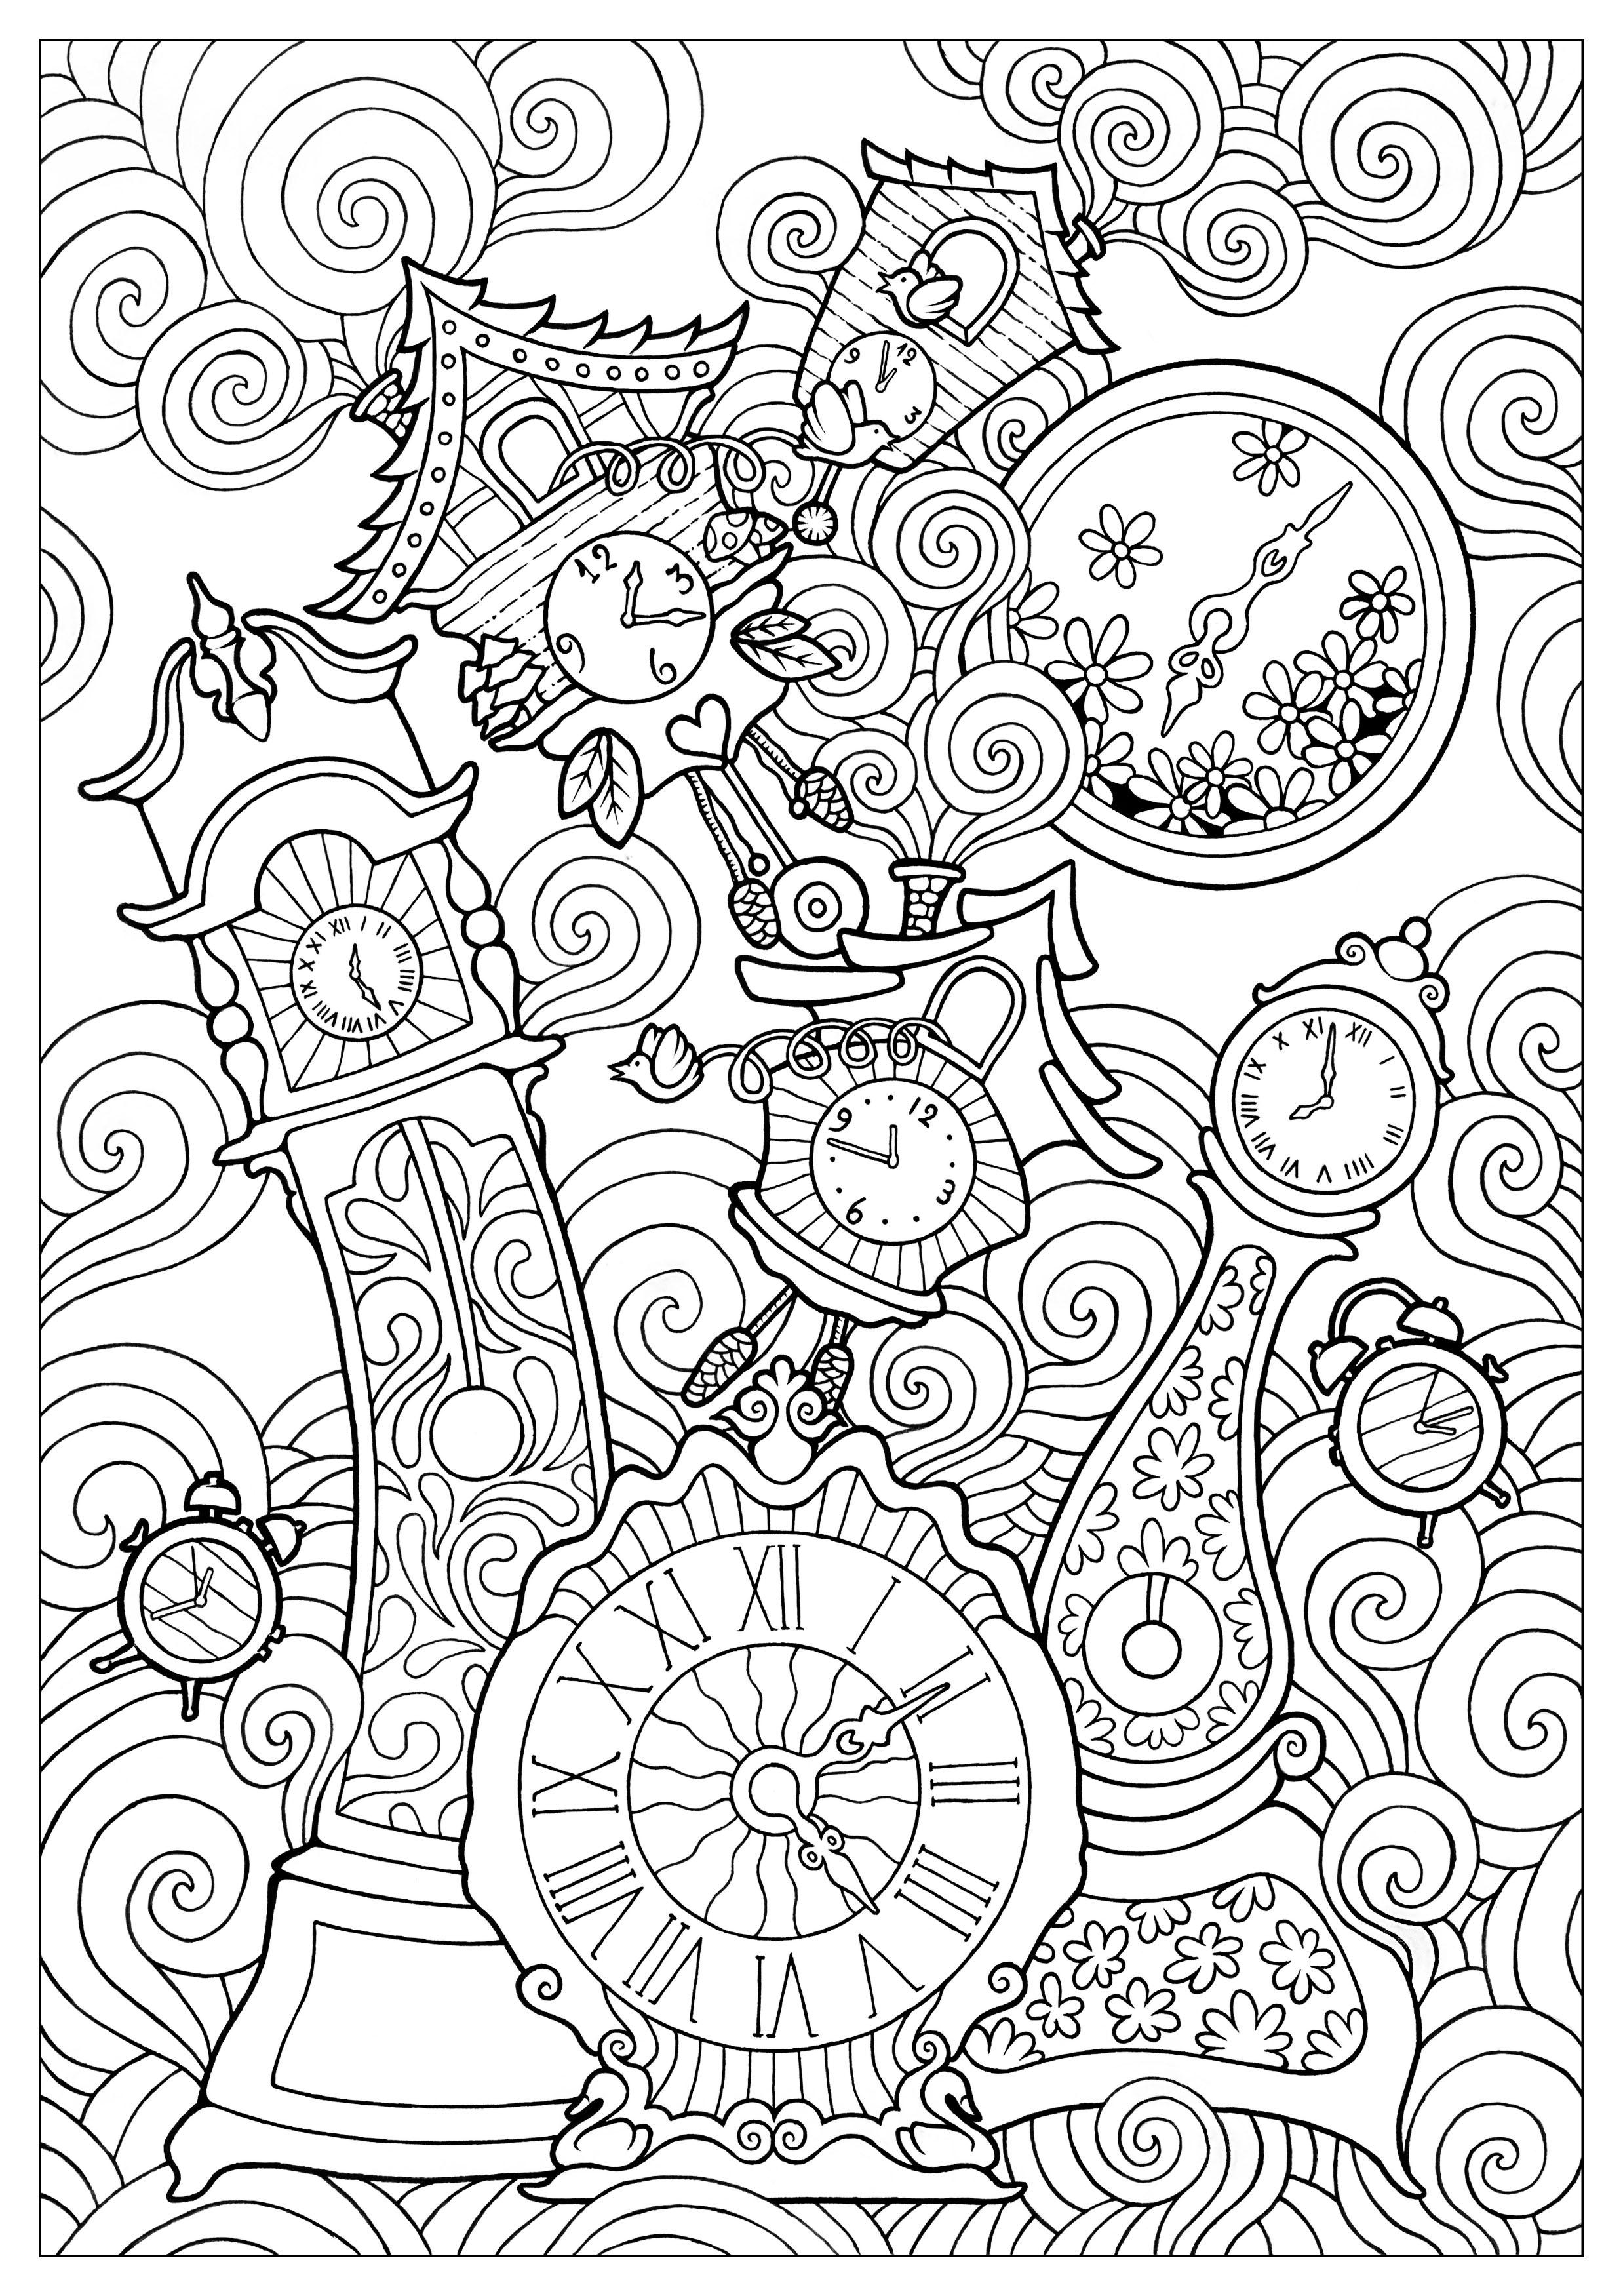 Quirky clocks konstantinos liaramantzas  Anti stress Adult Coloring Pages